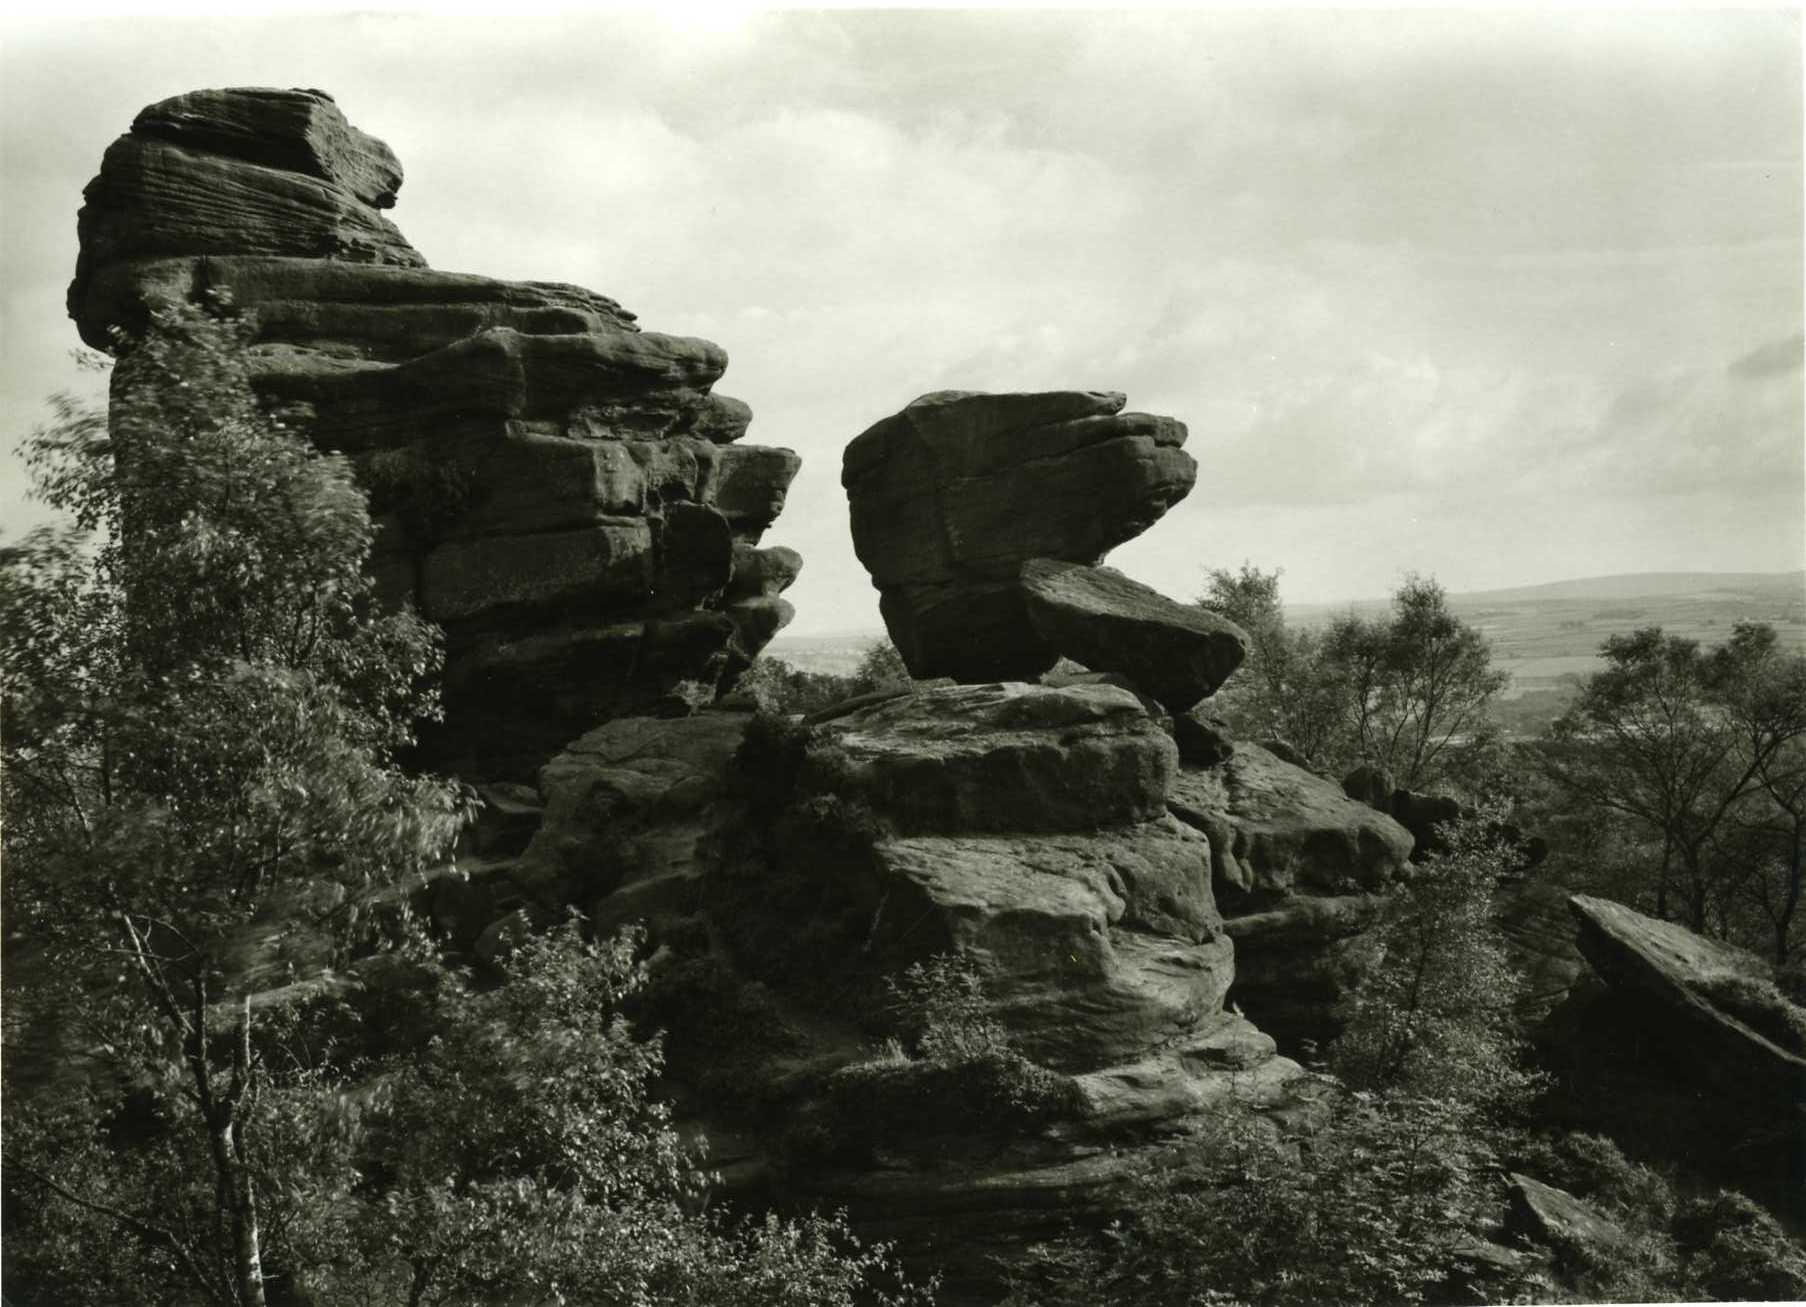 John Curno, Brimham Rocks,c1982